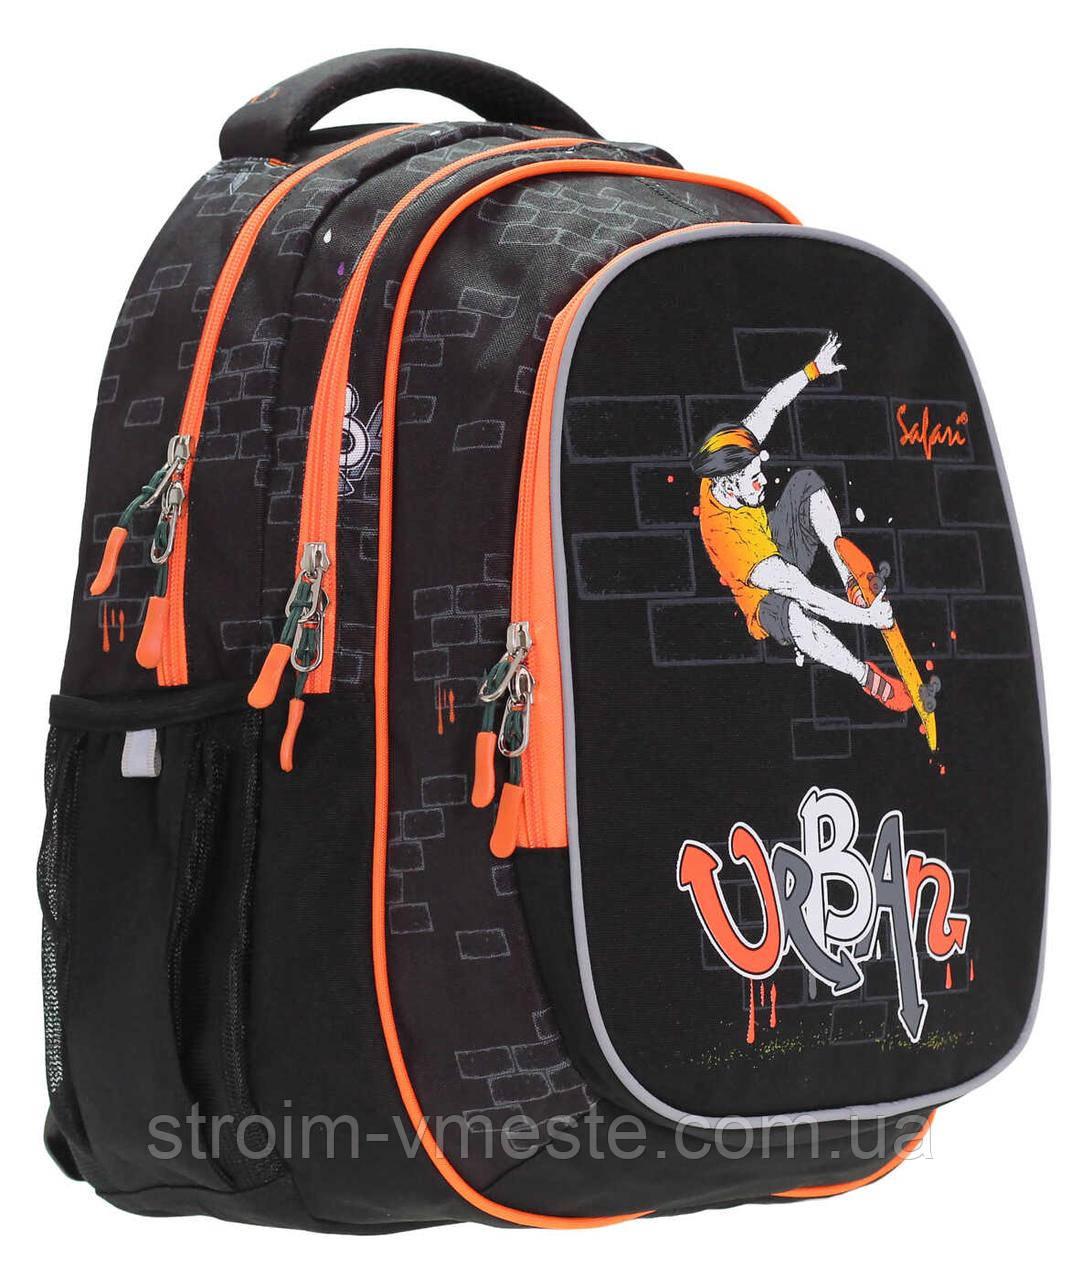 Рюкзак, 3 отделения, 40*29*17см, PL, Safari Basic, 19-117M-1, SAFARI